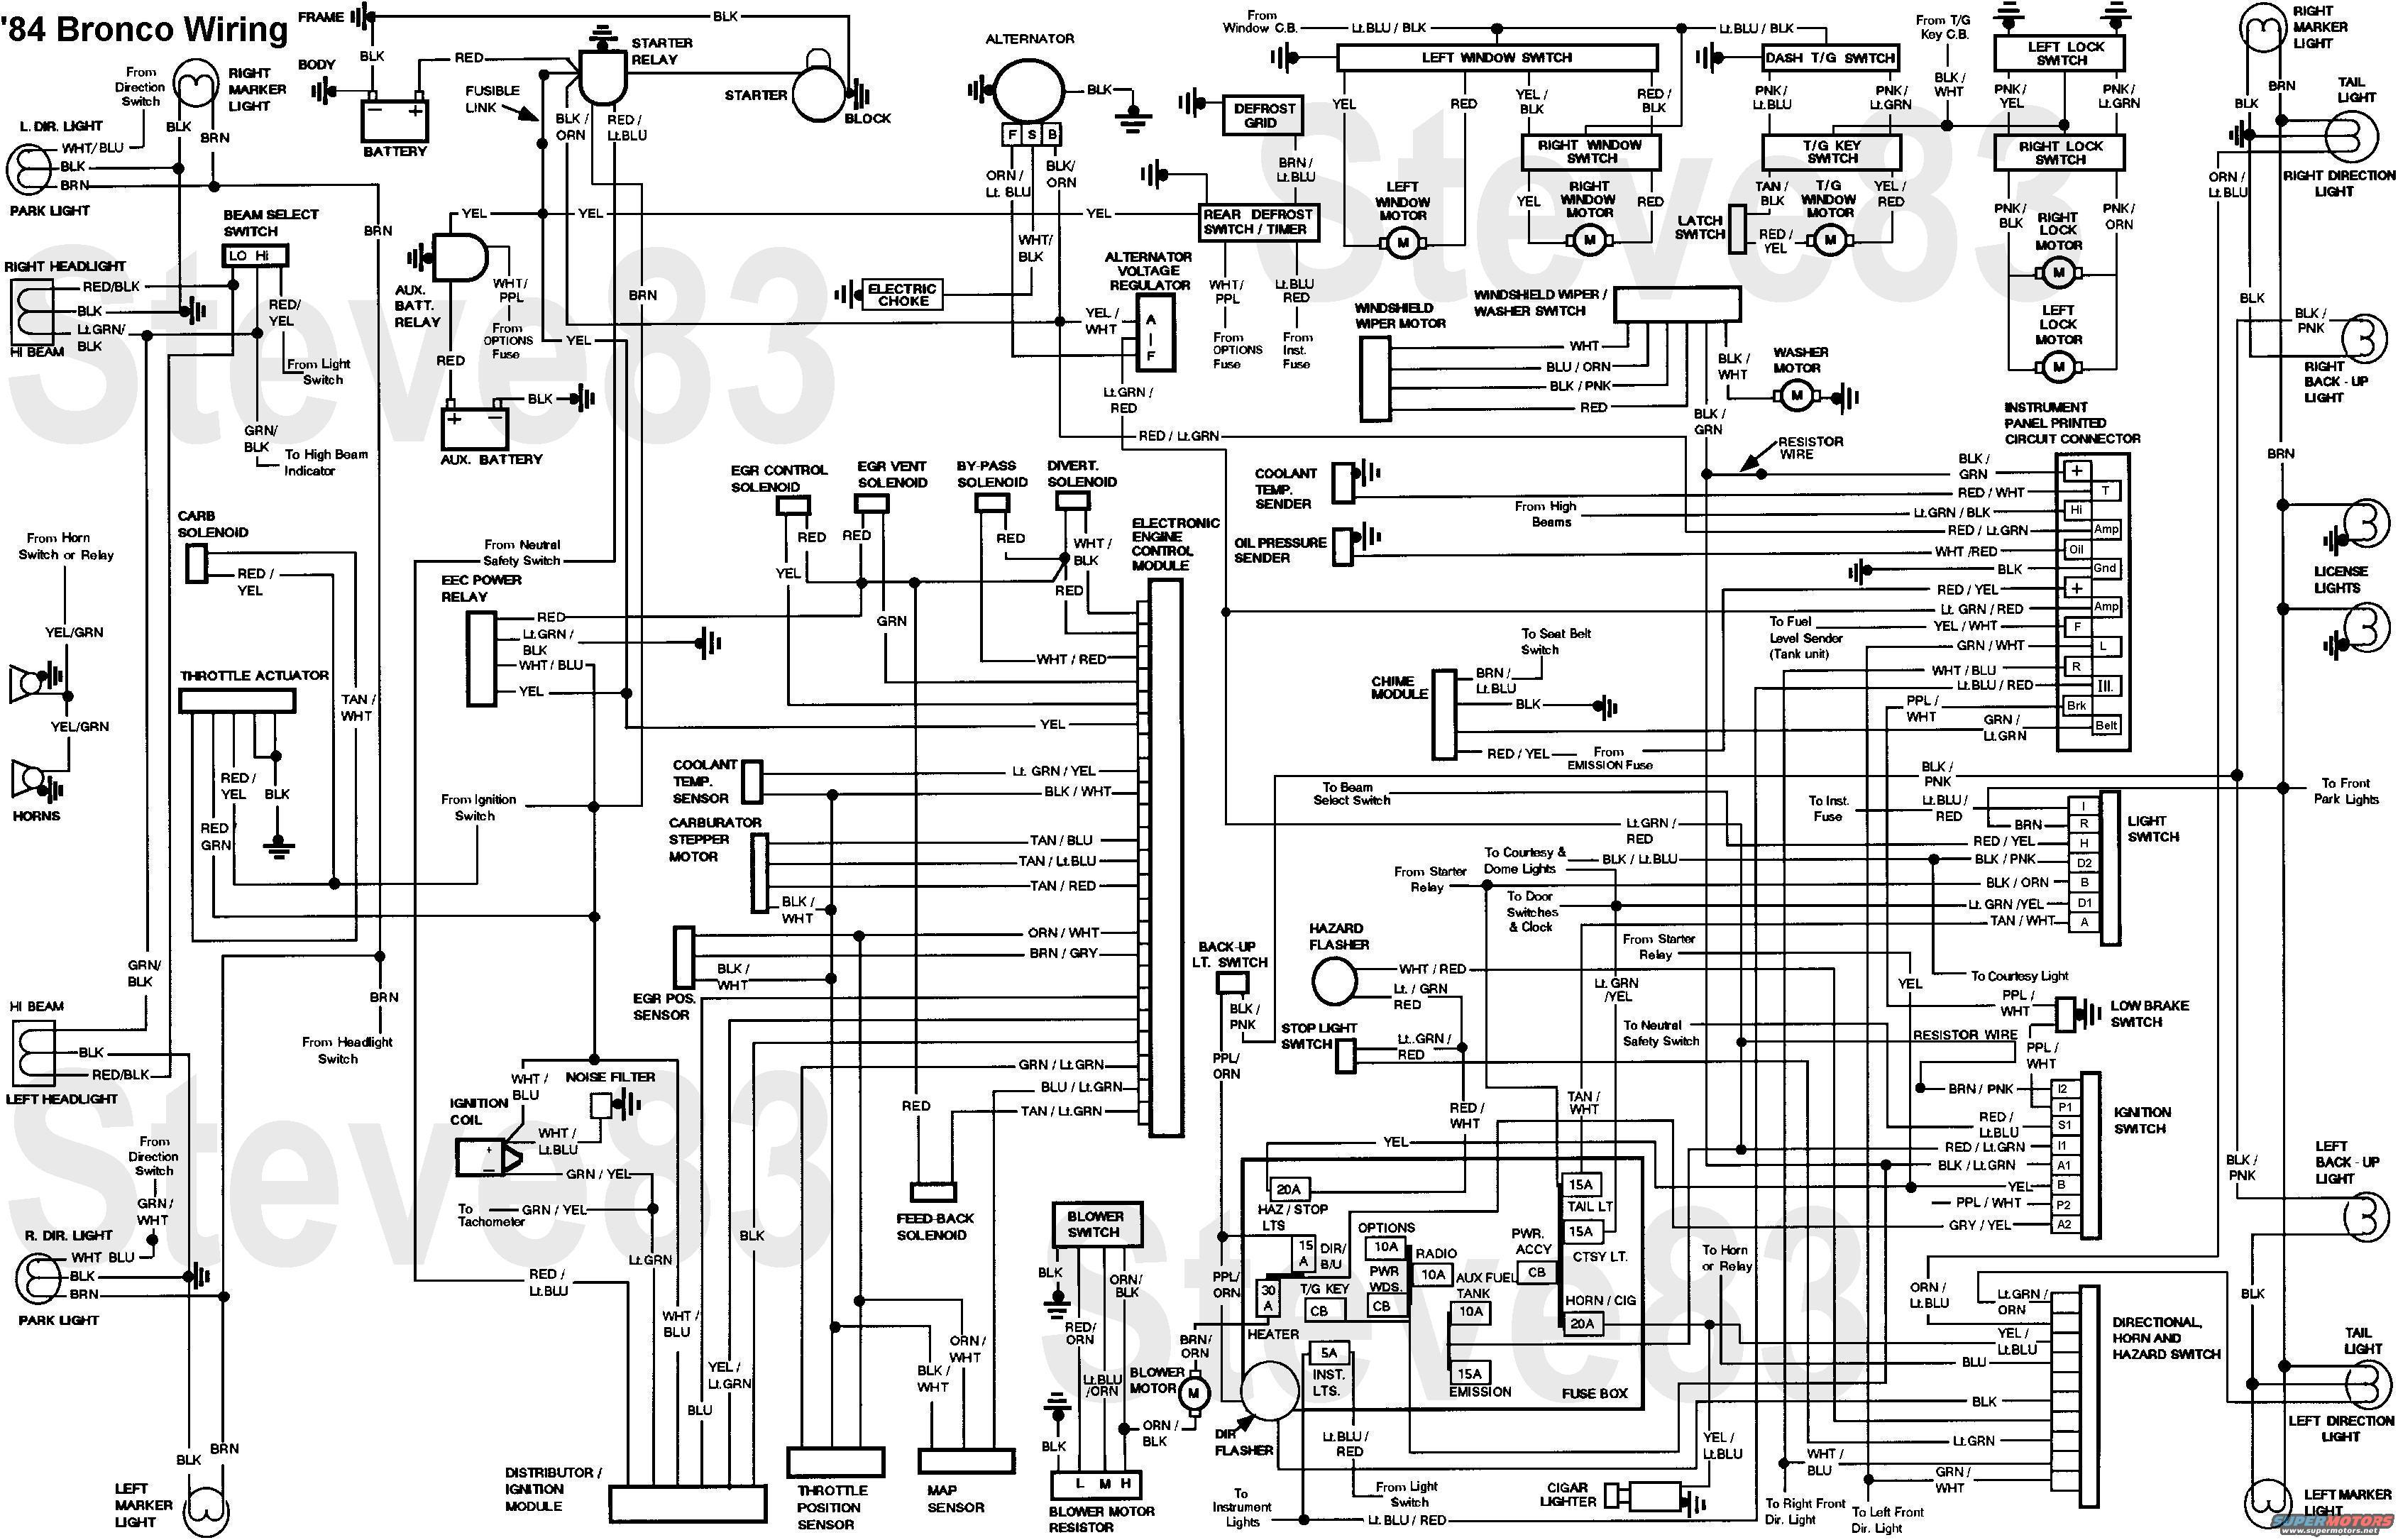 kubota l2550 wiring diagram wiring source u2022 rh nonprofit solutions co Kubota L2550 Service Manual L2550 Kubota Hydrolic Sight Glass